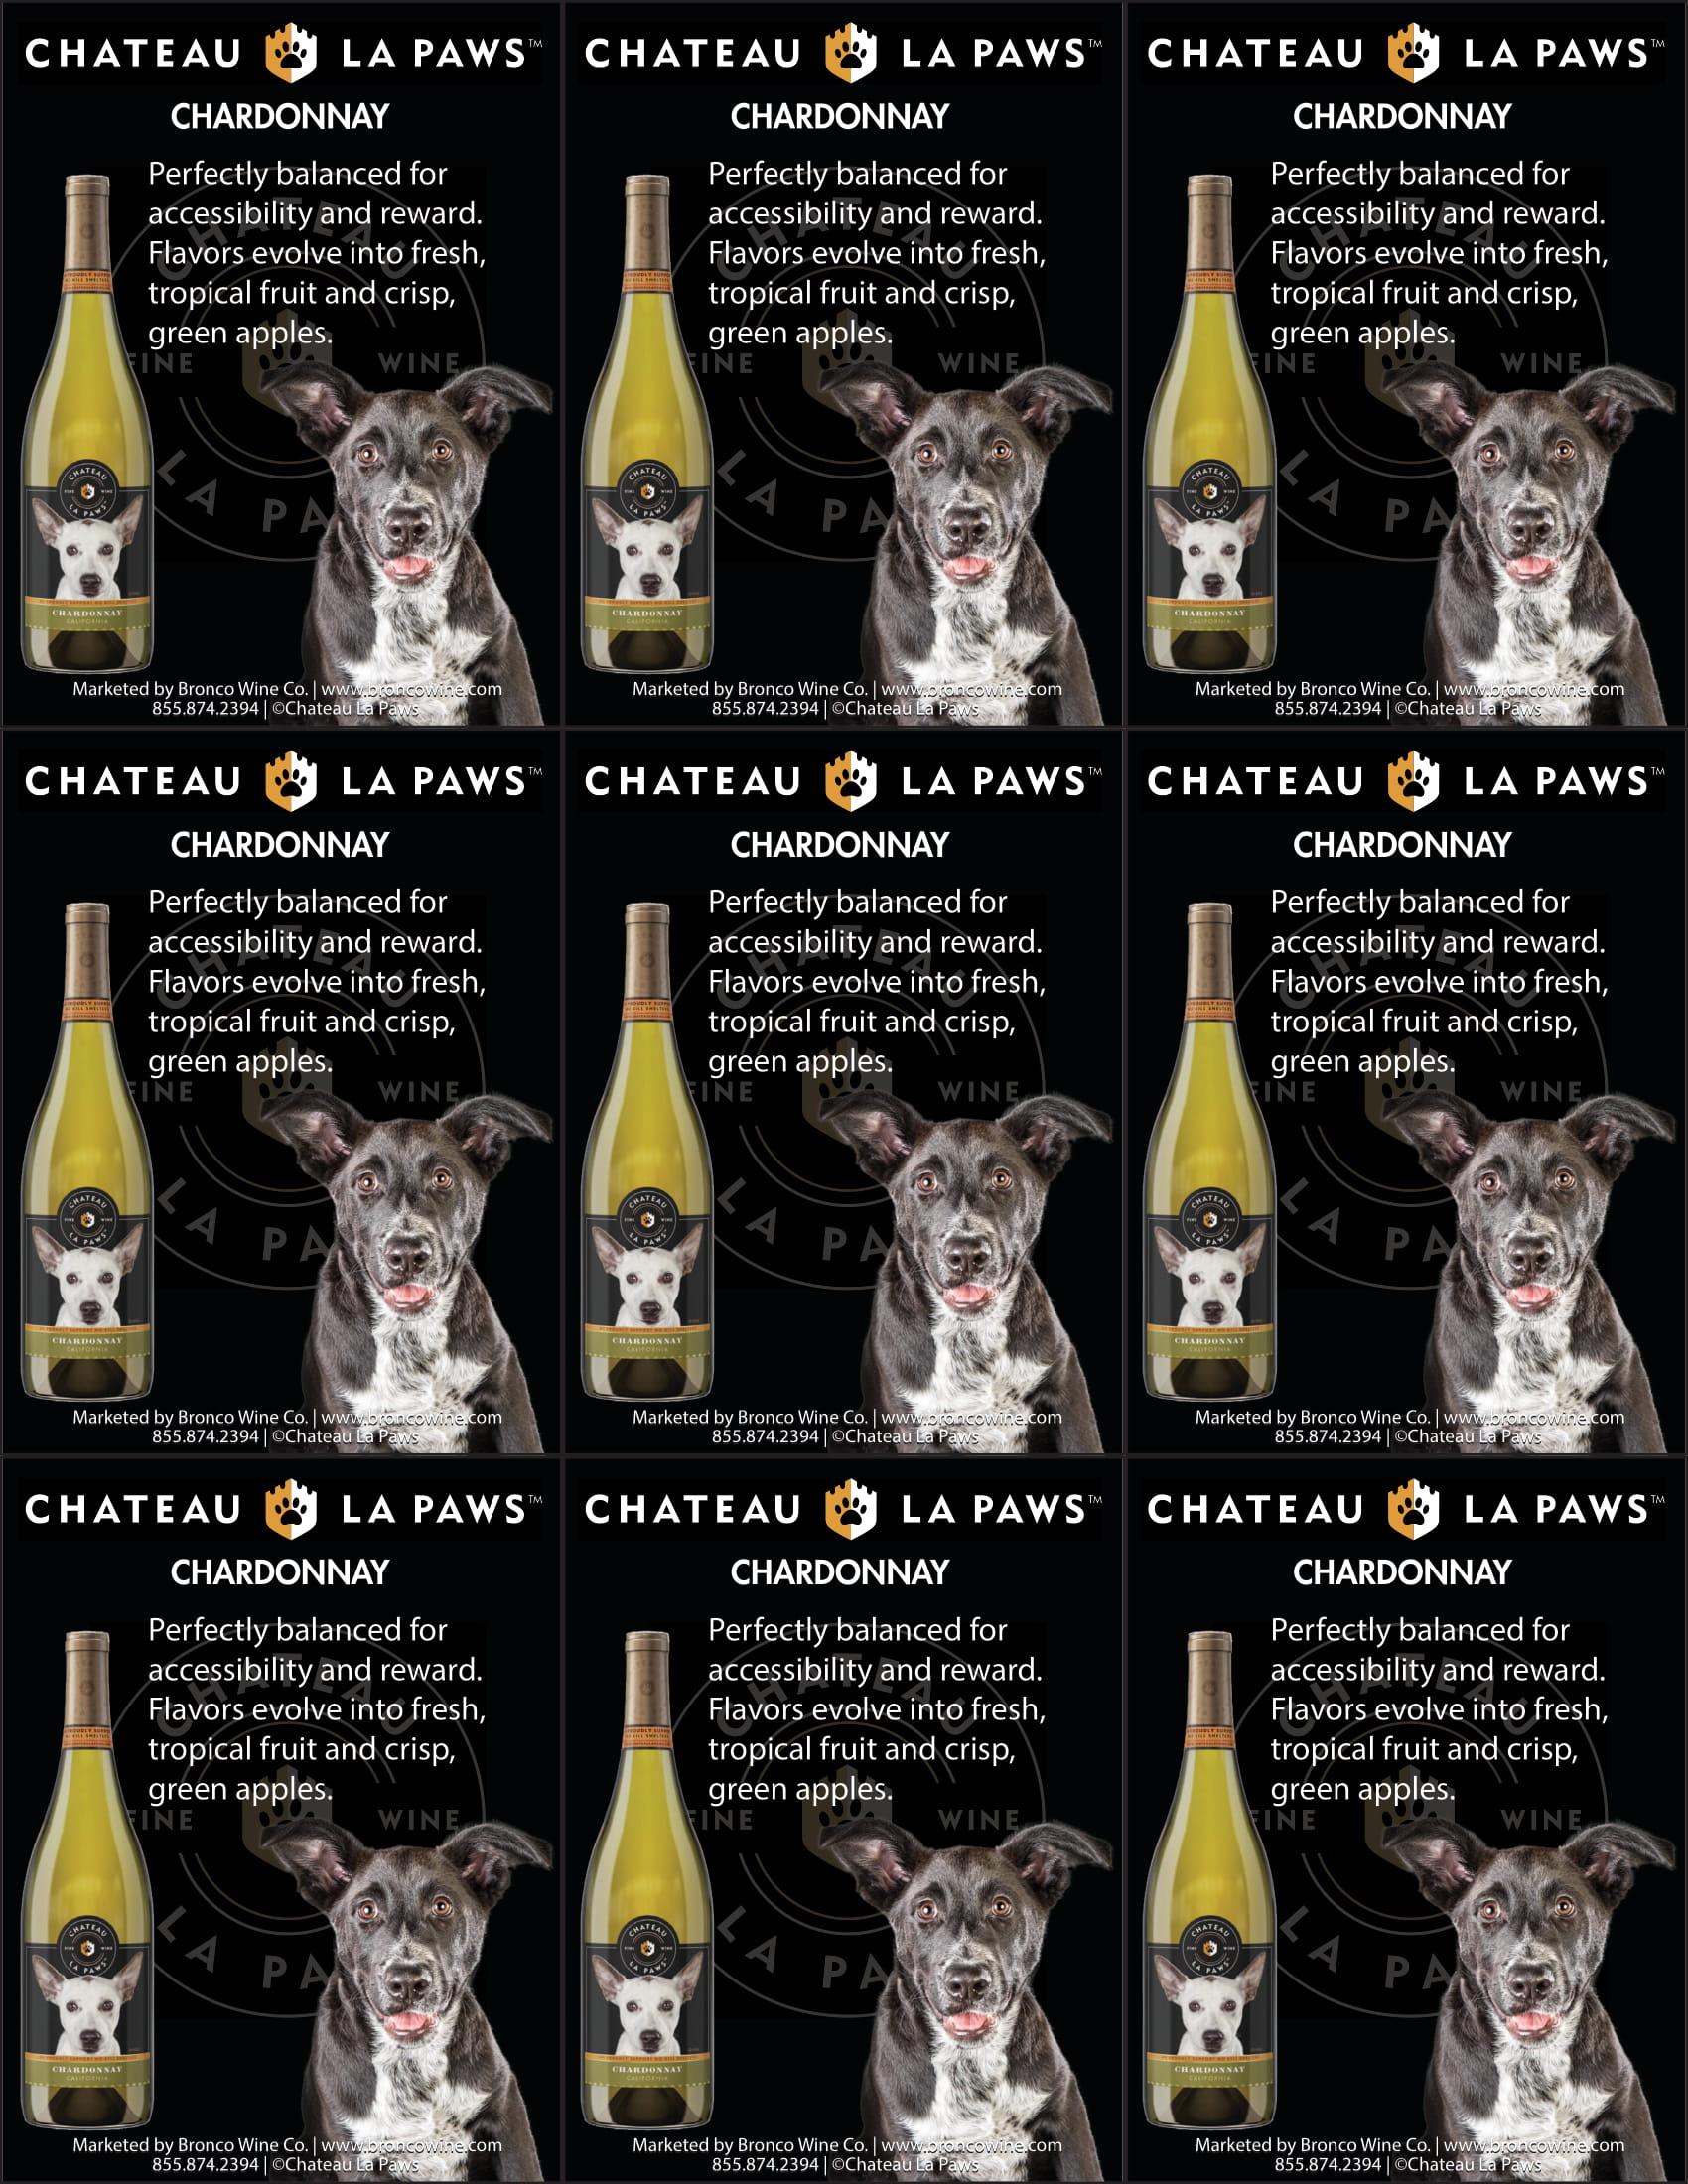 Chateau La Paws Chardonnay Shelf Talkers